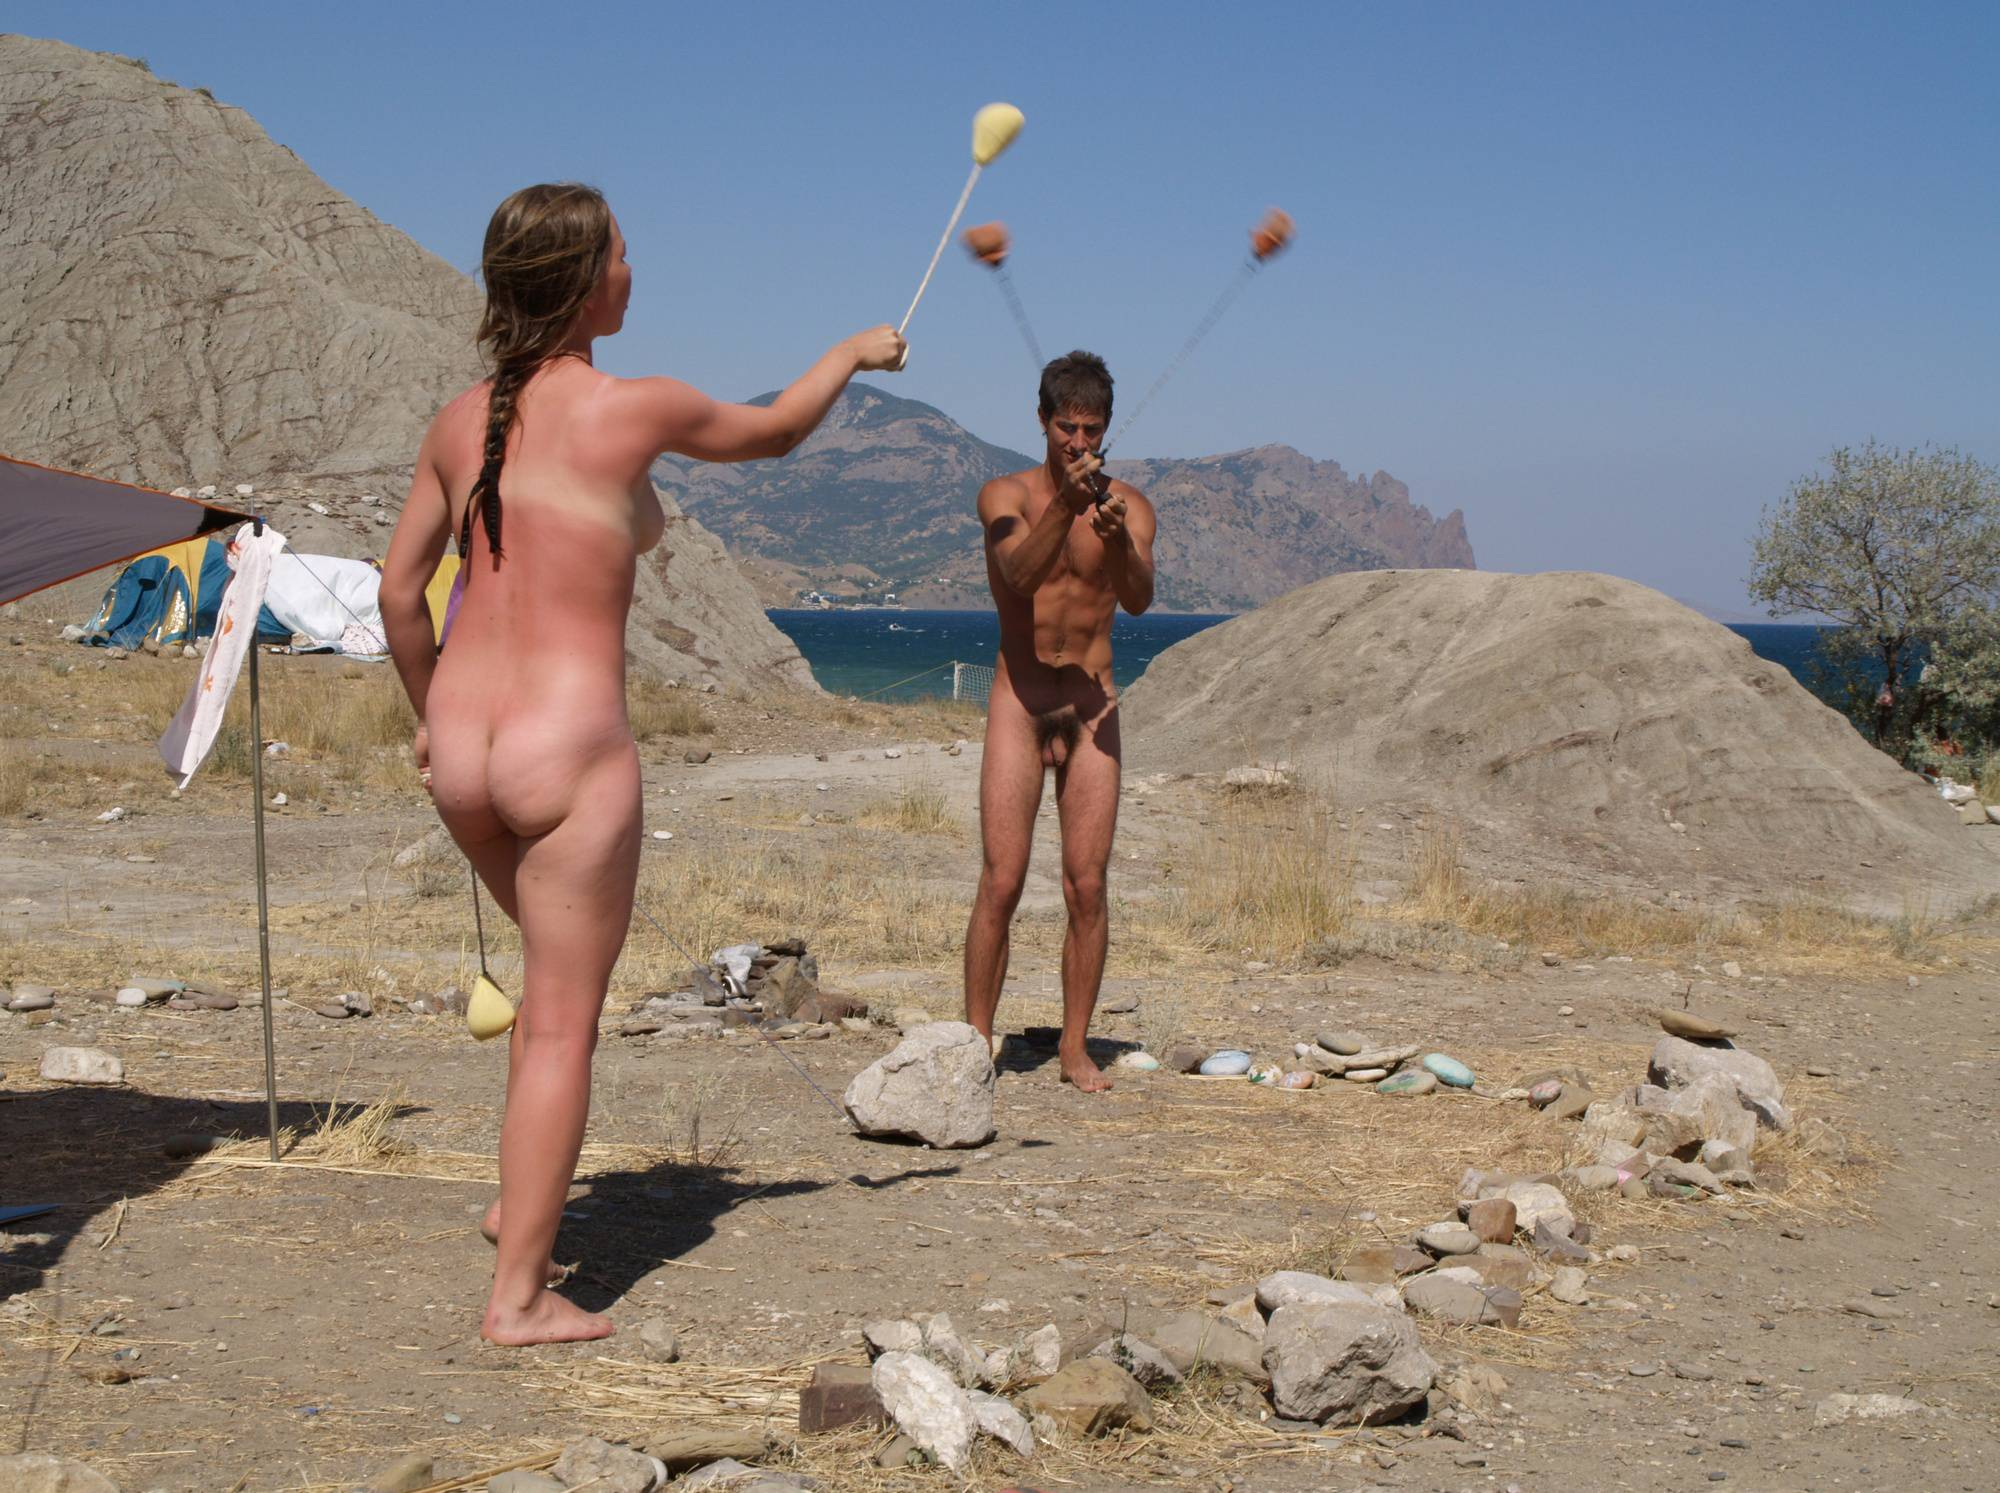 Nudist Gallery Outdoor Swinging Angels - 1